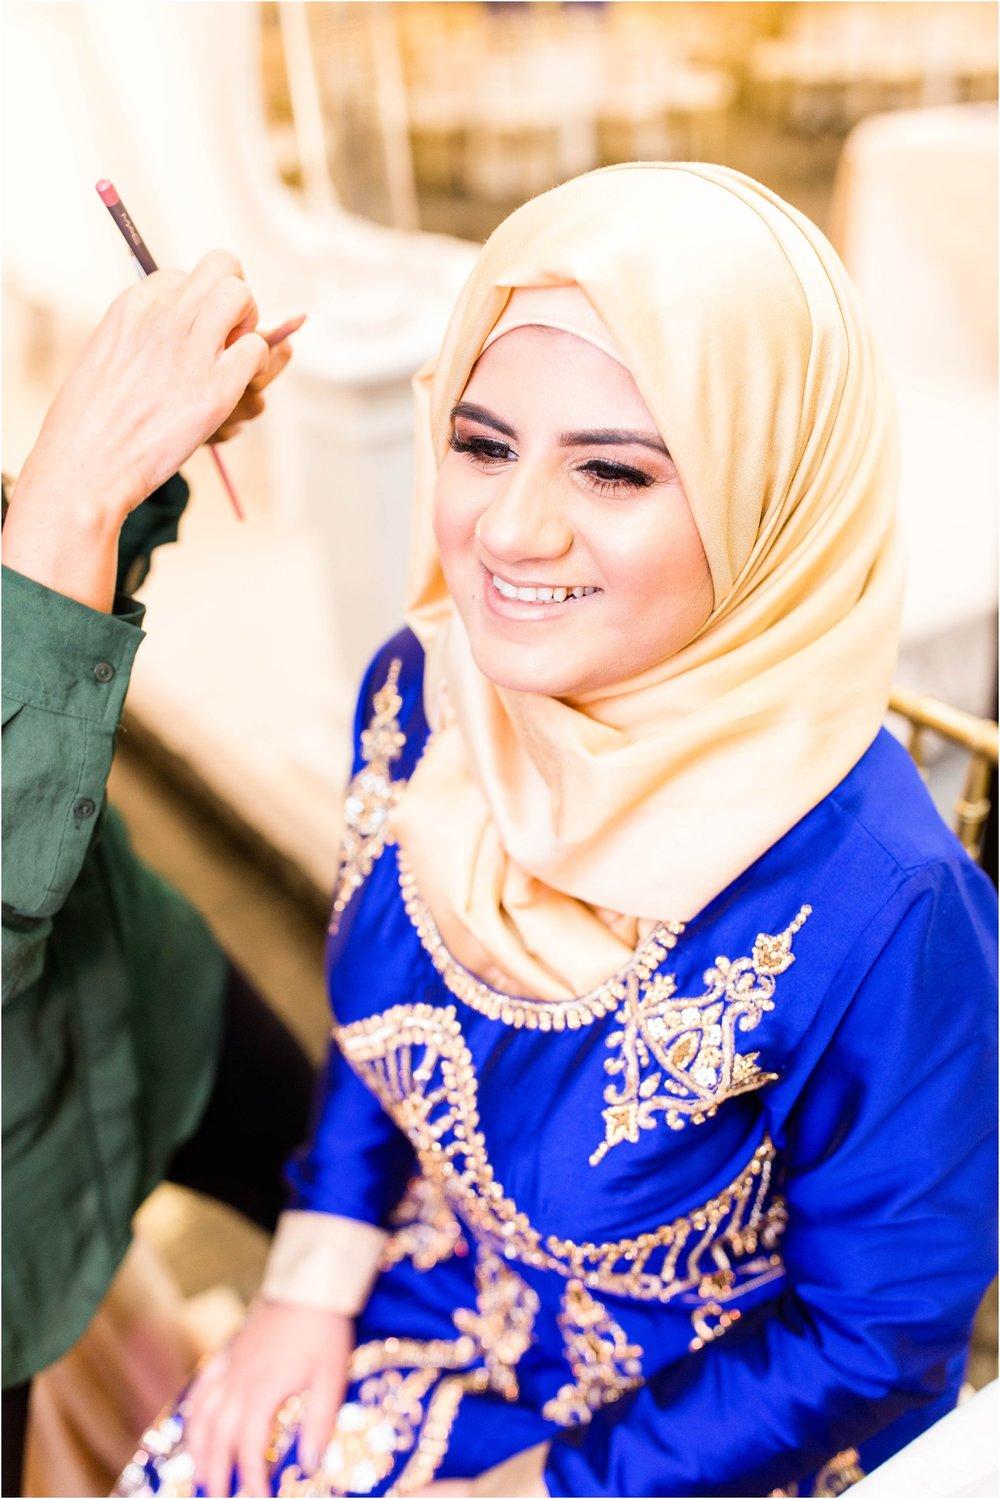 Estate-Banquet-Hall-Wedding-Toronto-Mississauga-Brampton-Scarborough-GTA-Pakistani-Indian-Wedding-Engagement-Photographer-Photography_0010.jpg